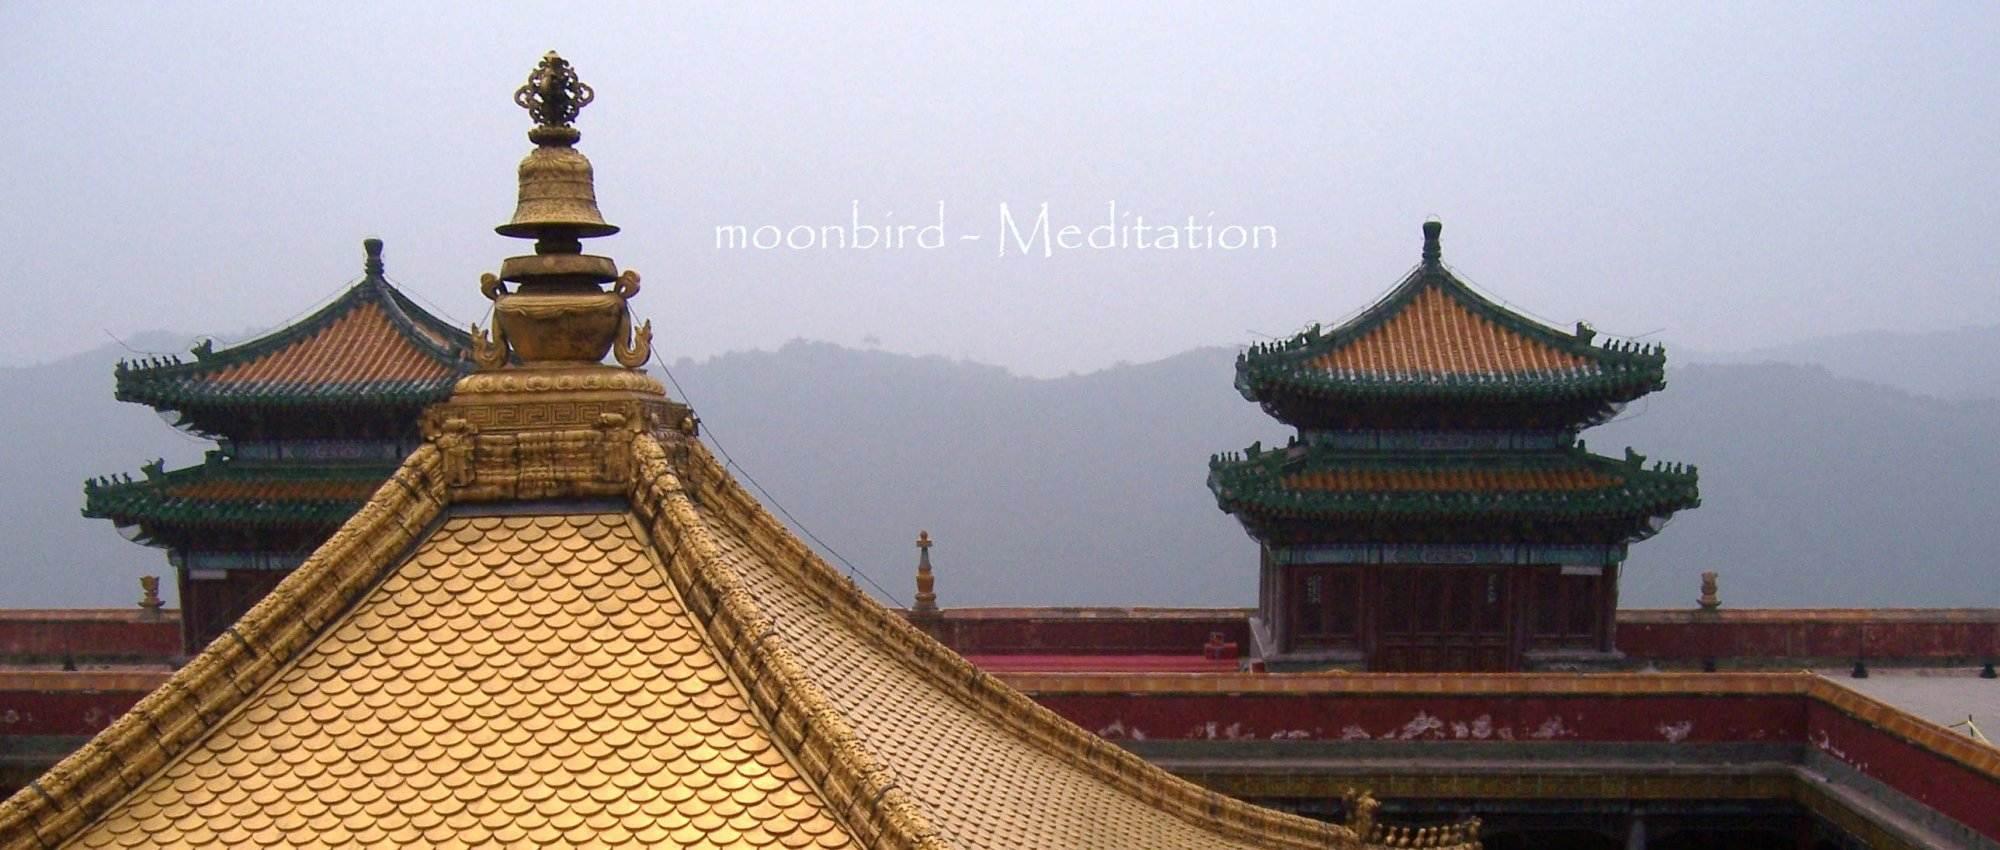 meditation mandala friedrichsdorf